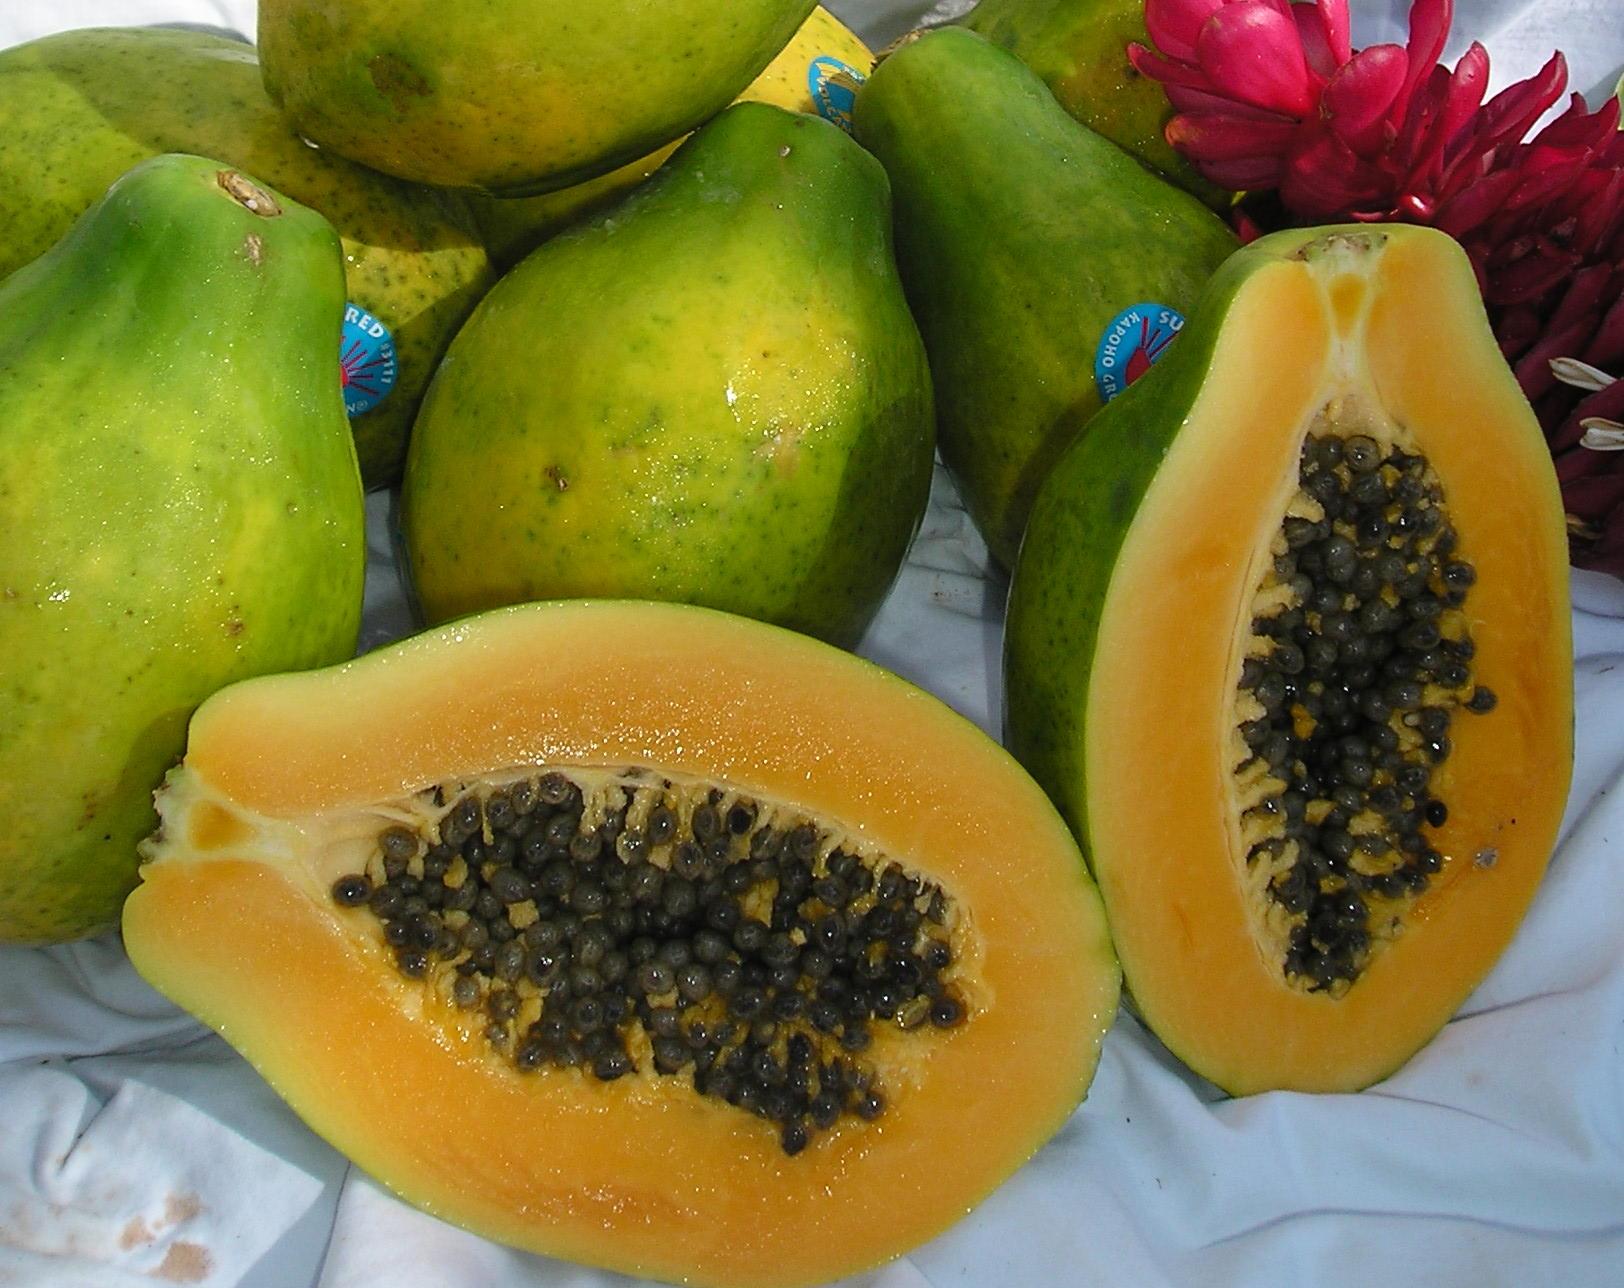 Hawaii papaya